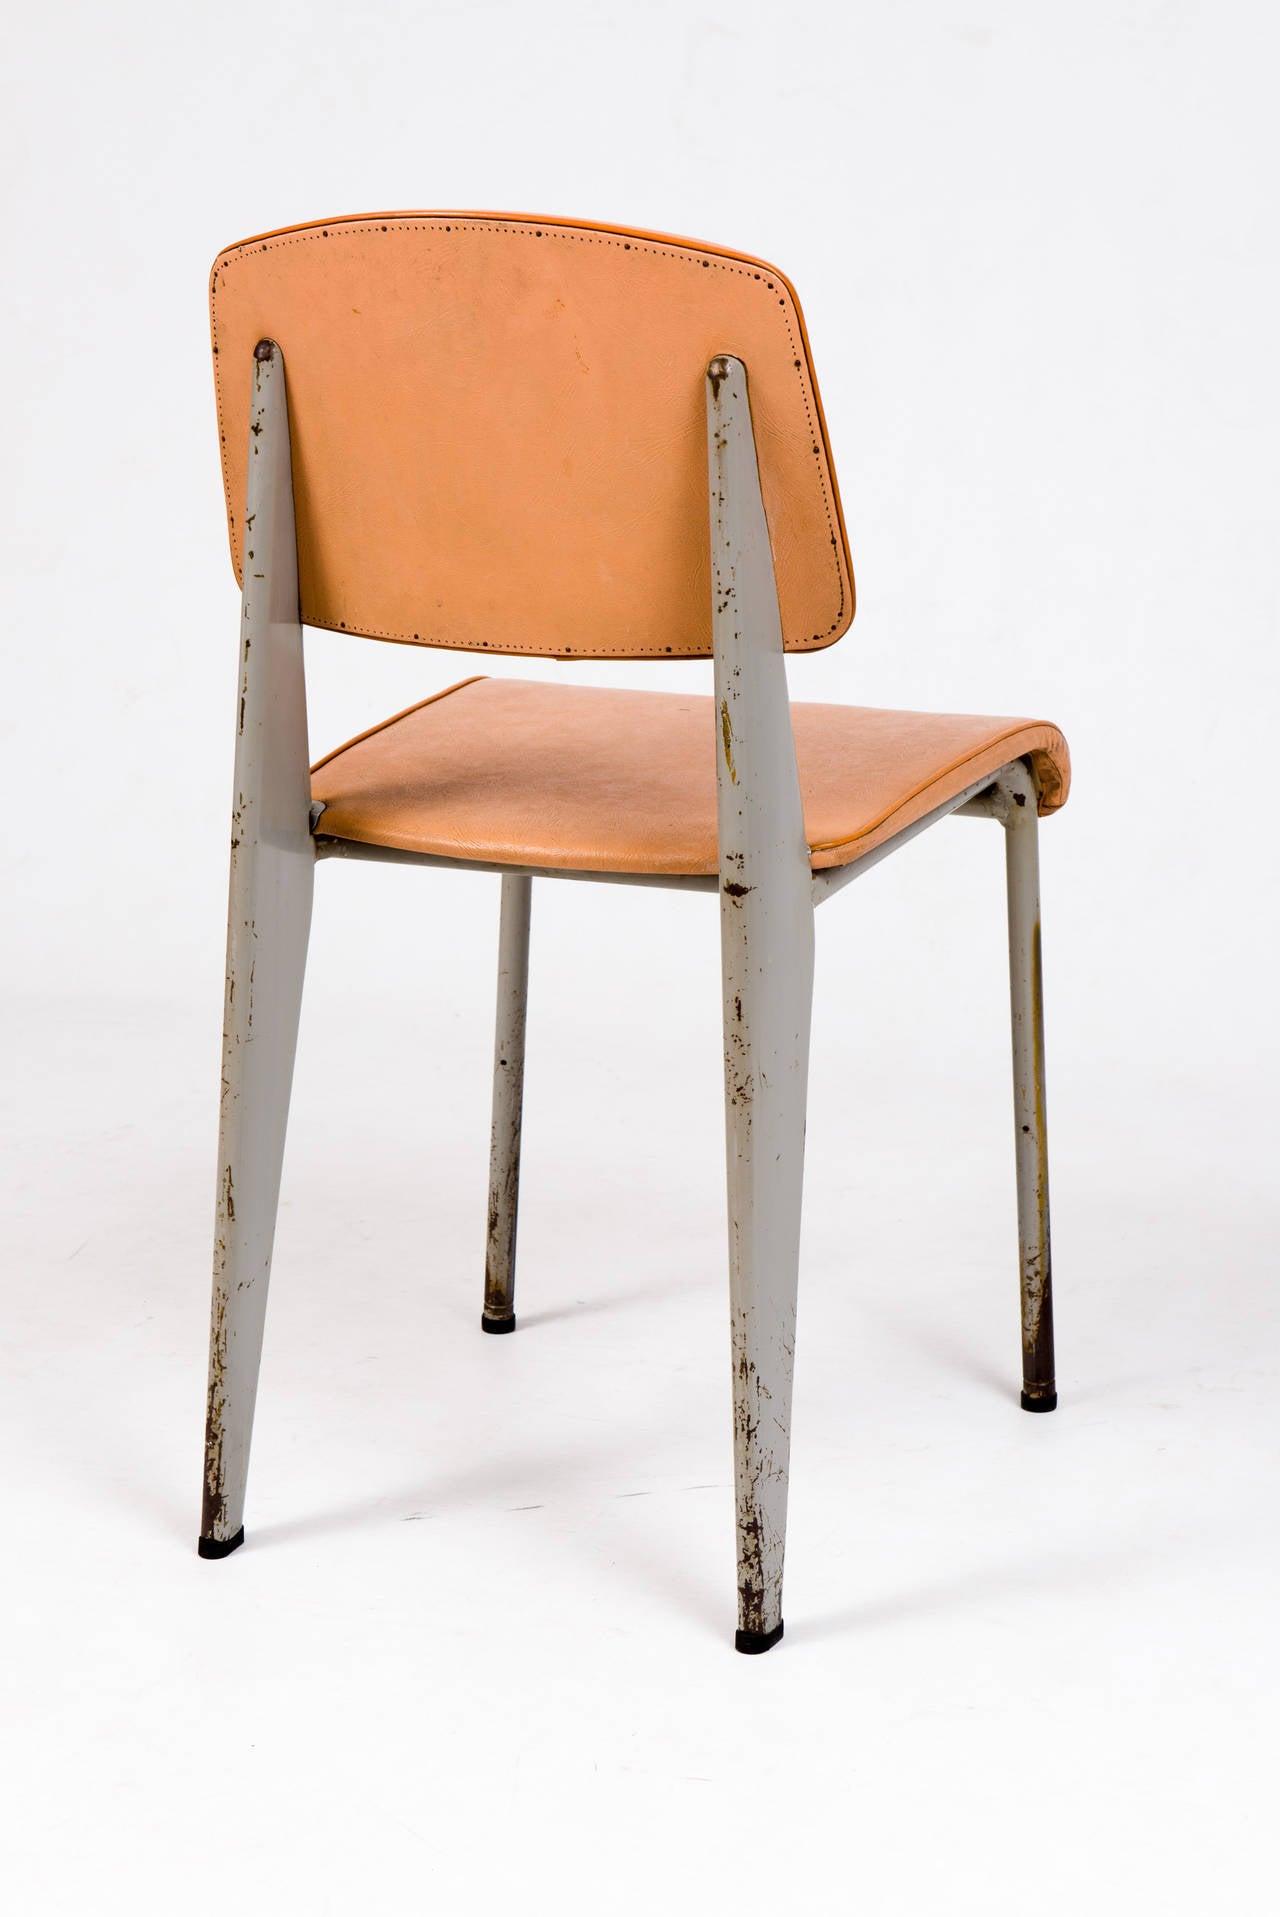 Standard Chair by Jean Prouv for Les Ateliers de Jean